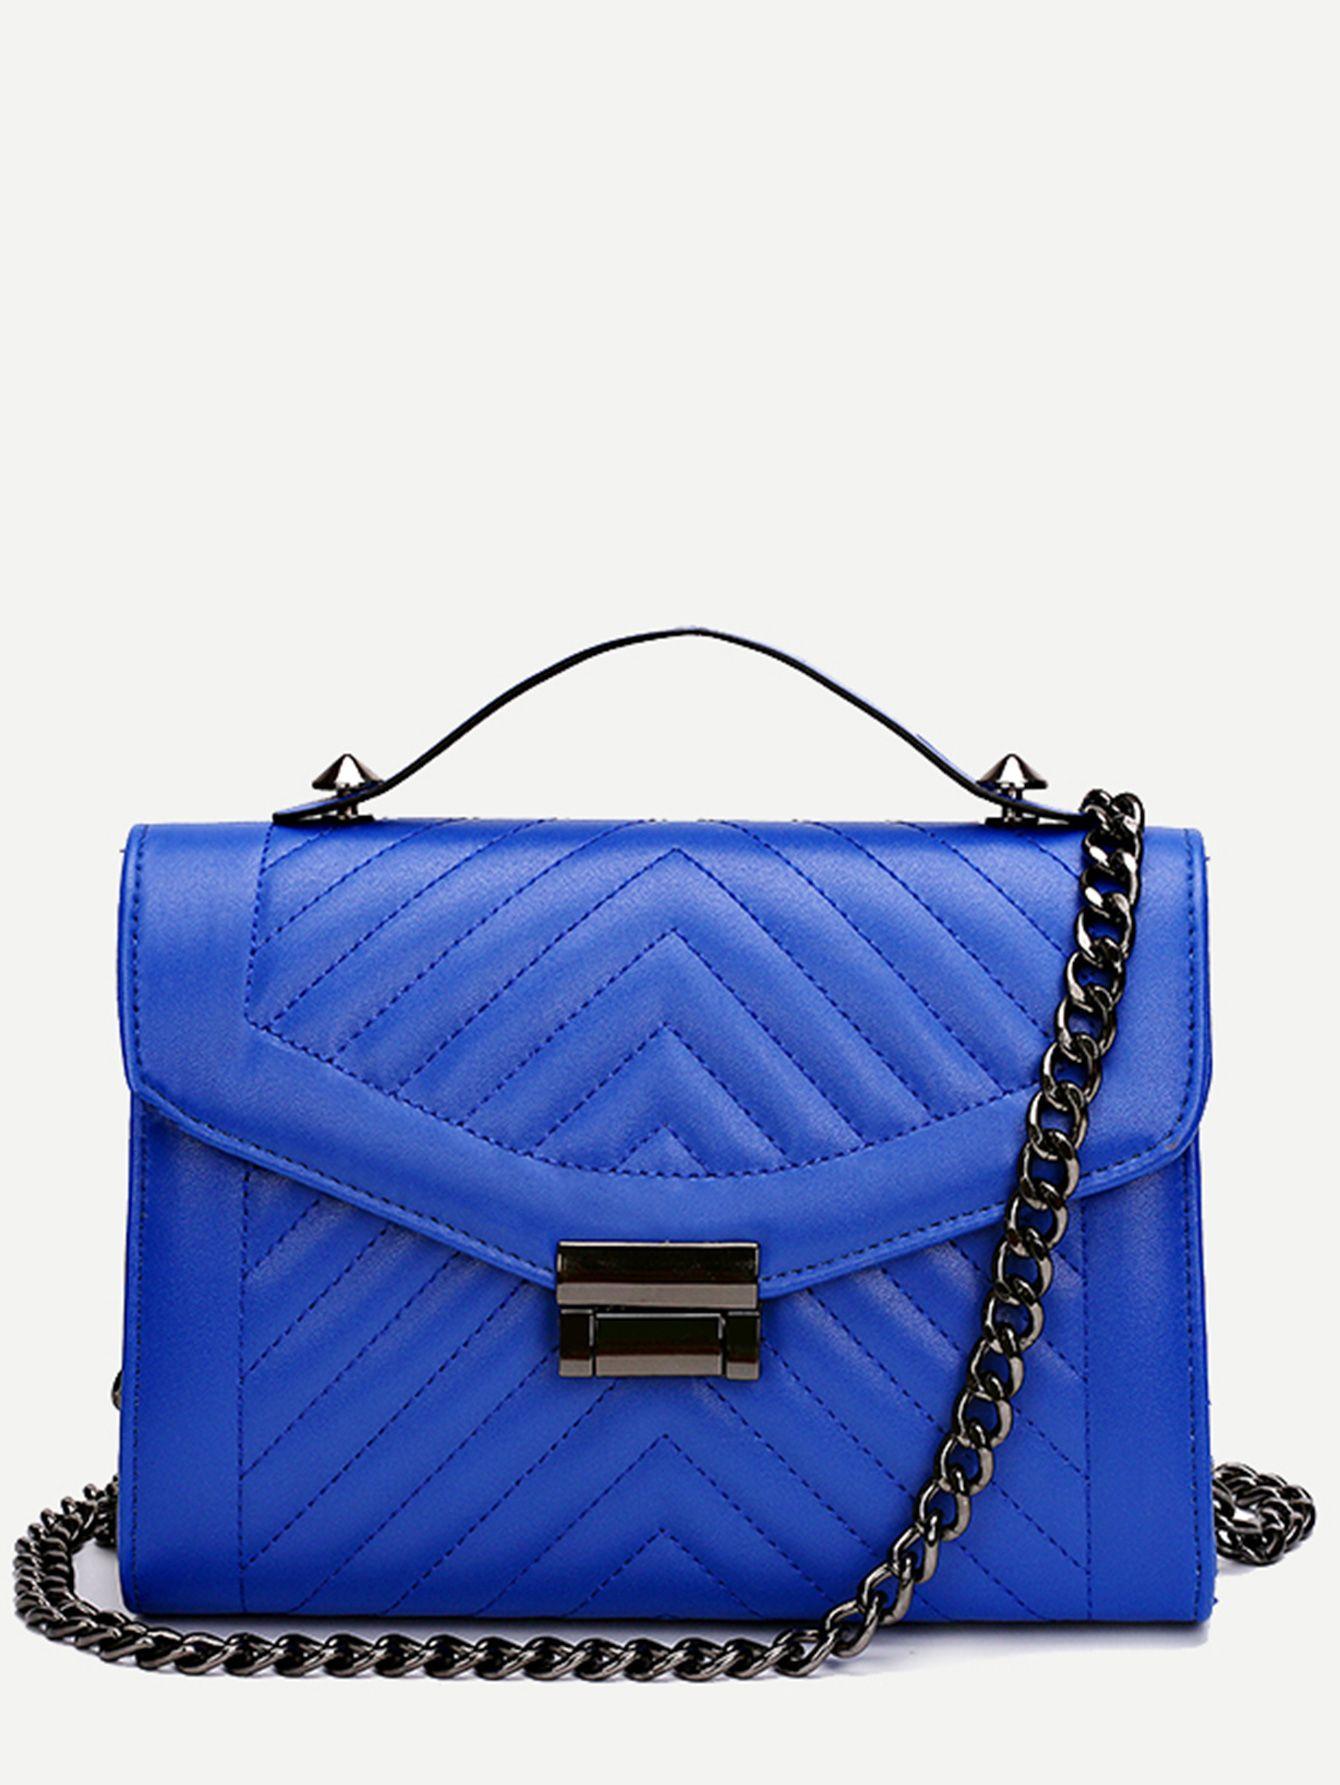 Toping Fine Luxury women handbag women Messenger bags summer samll Fashion Chain Casual Shoulder bag